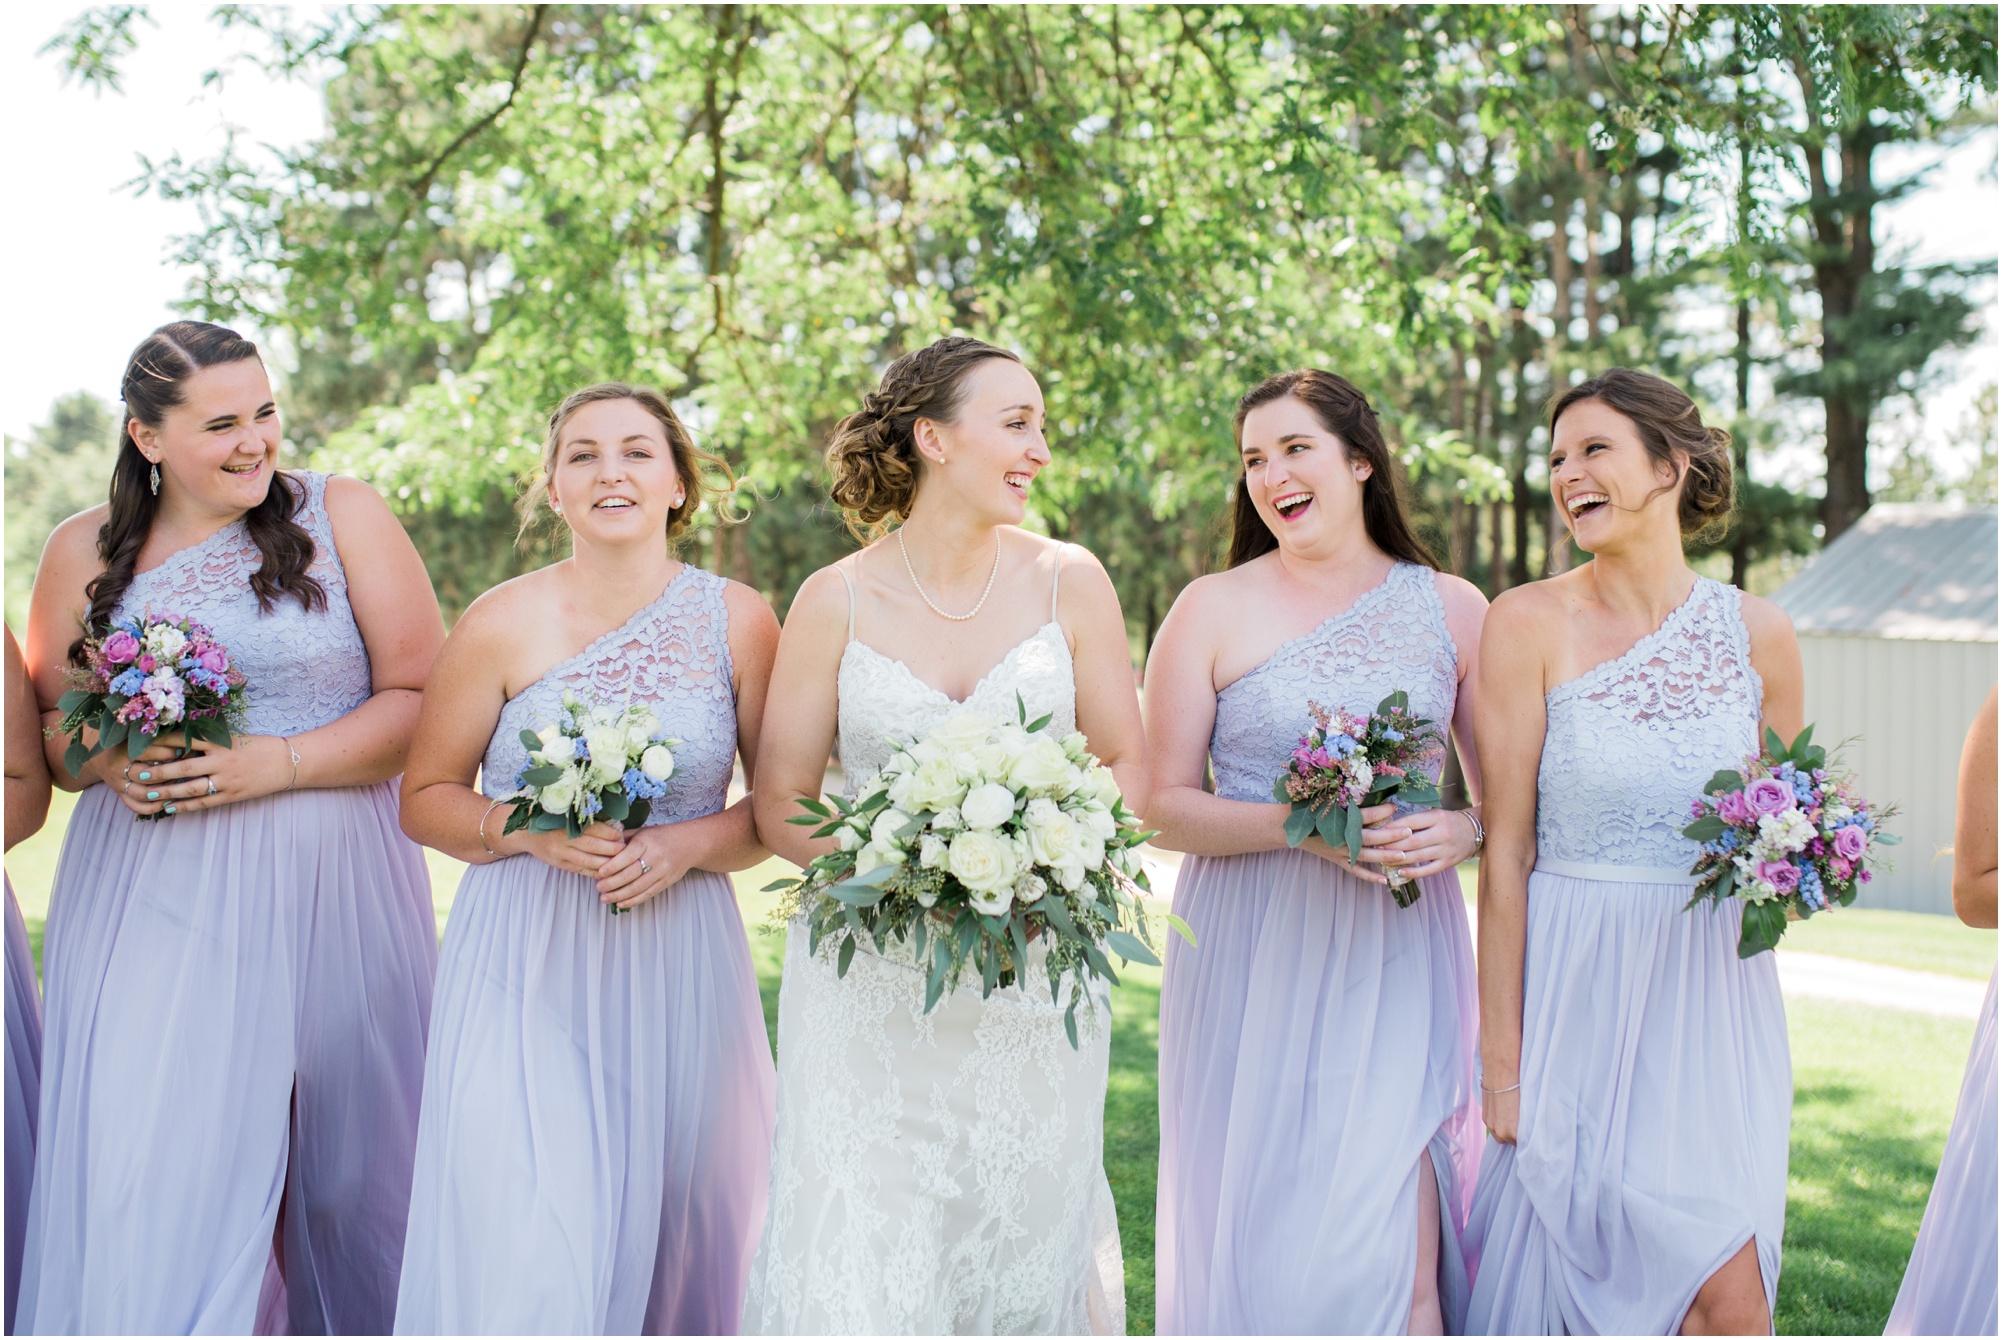 Wisconsin-Wedding-Photographer-Reedsburg-Country-Club-Kaela-and Matt-Wedding-140.jpg